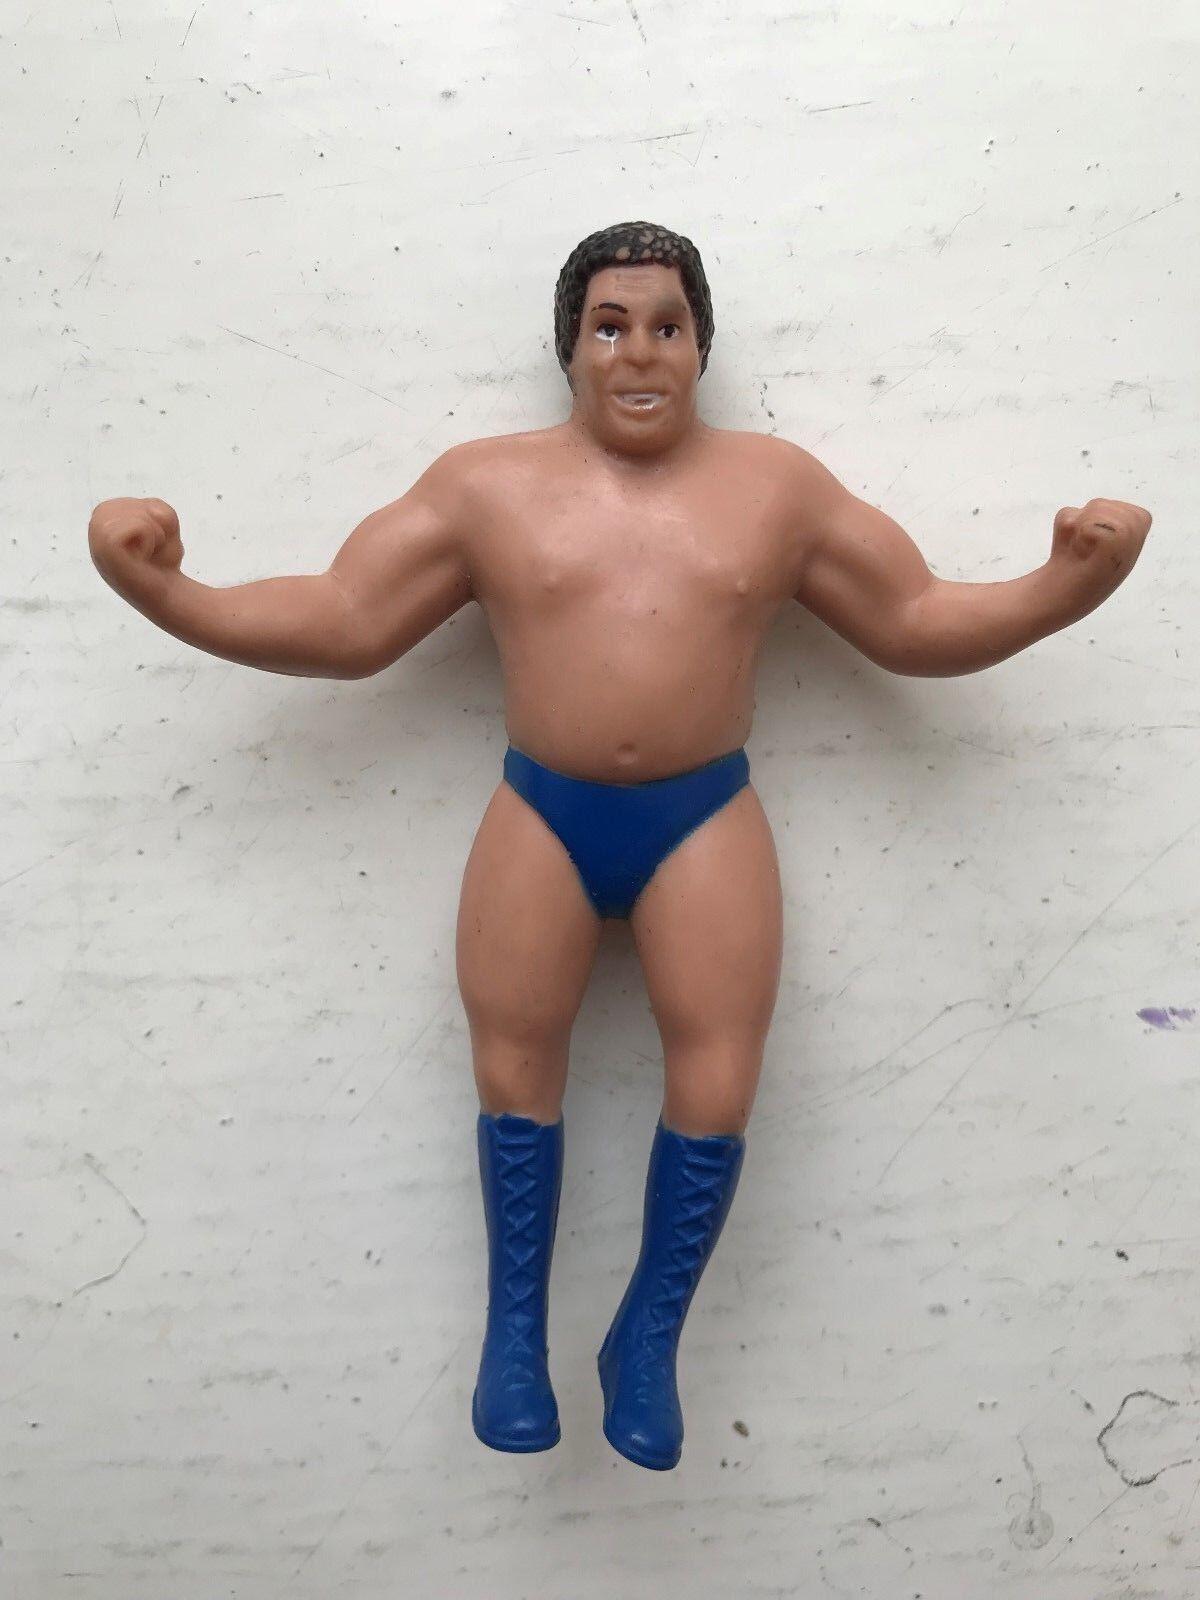 CLASSIC WWF WWE ANDRE THE GIANT LJN BEND EMS WRESTLING FIGURE TITAN SPORTS